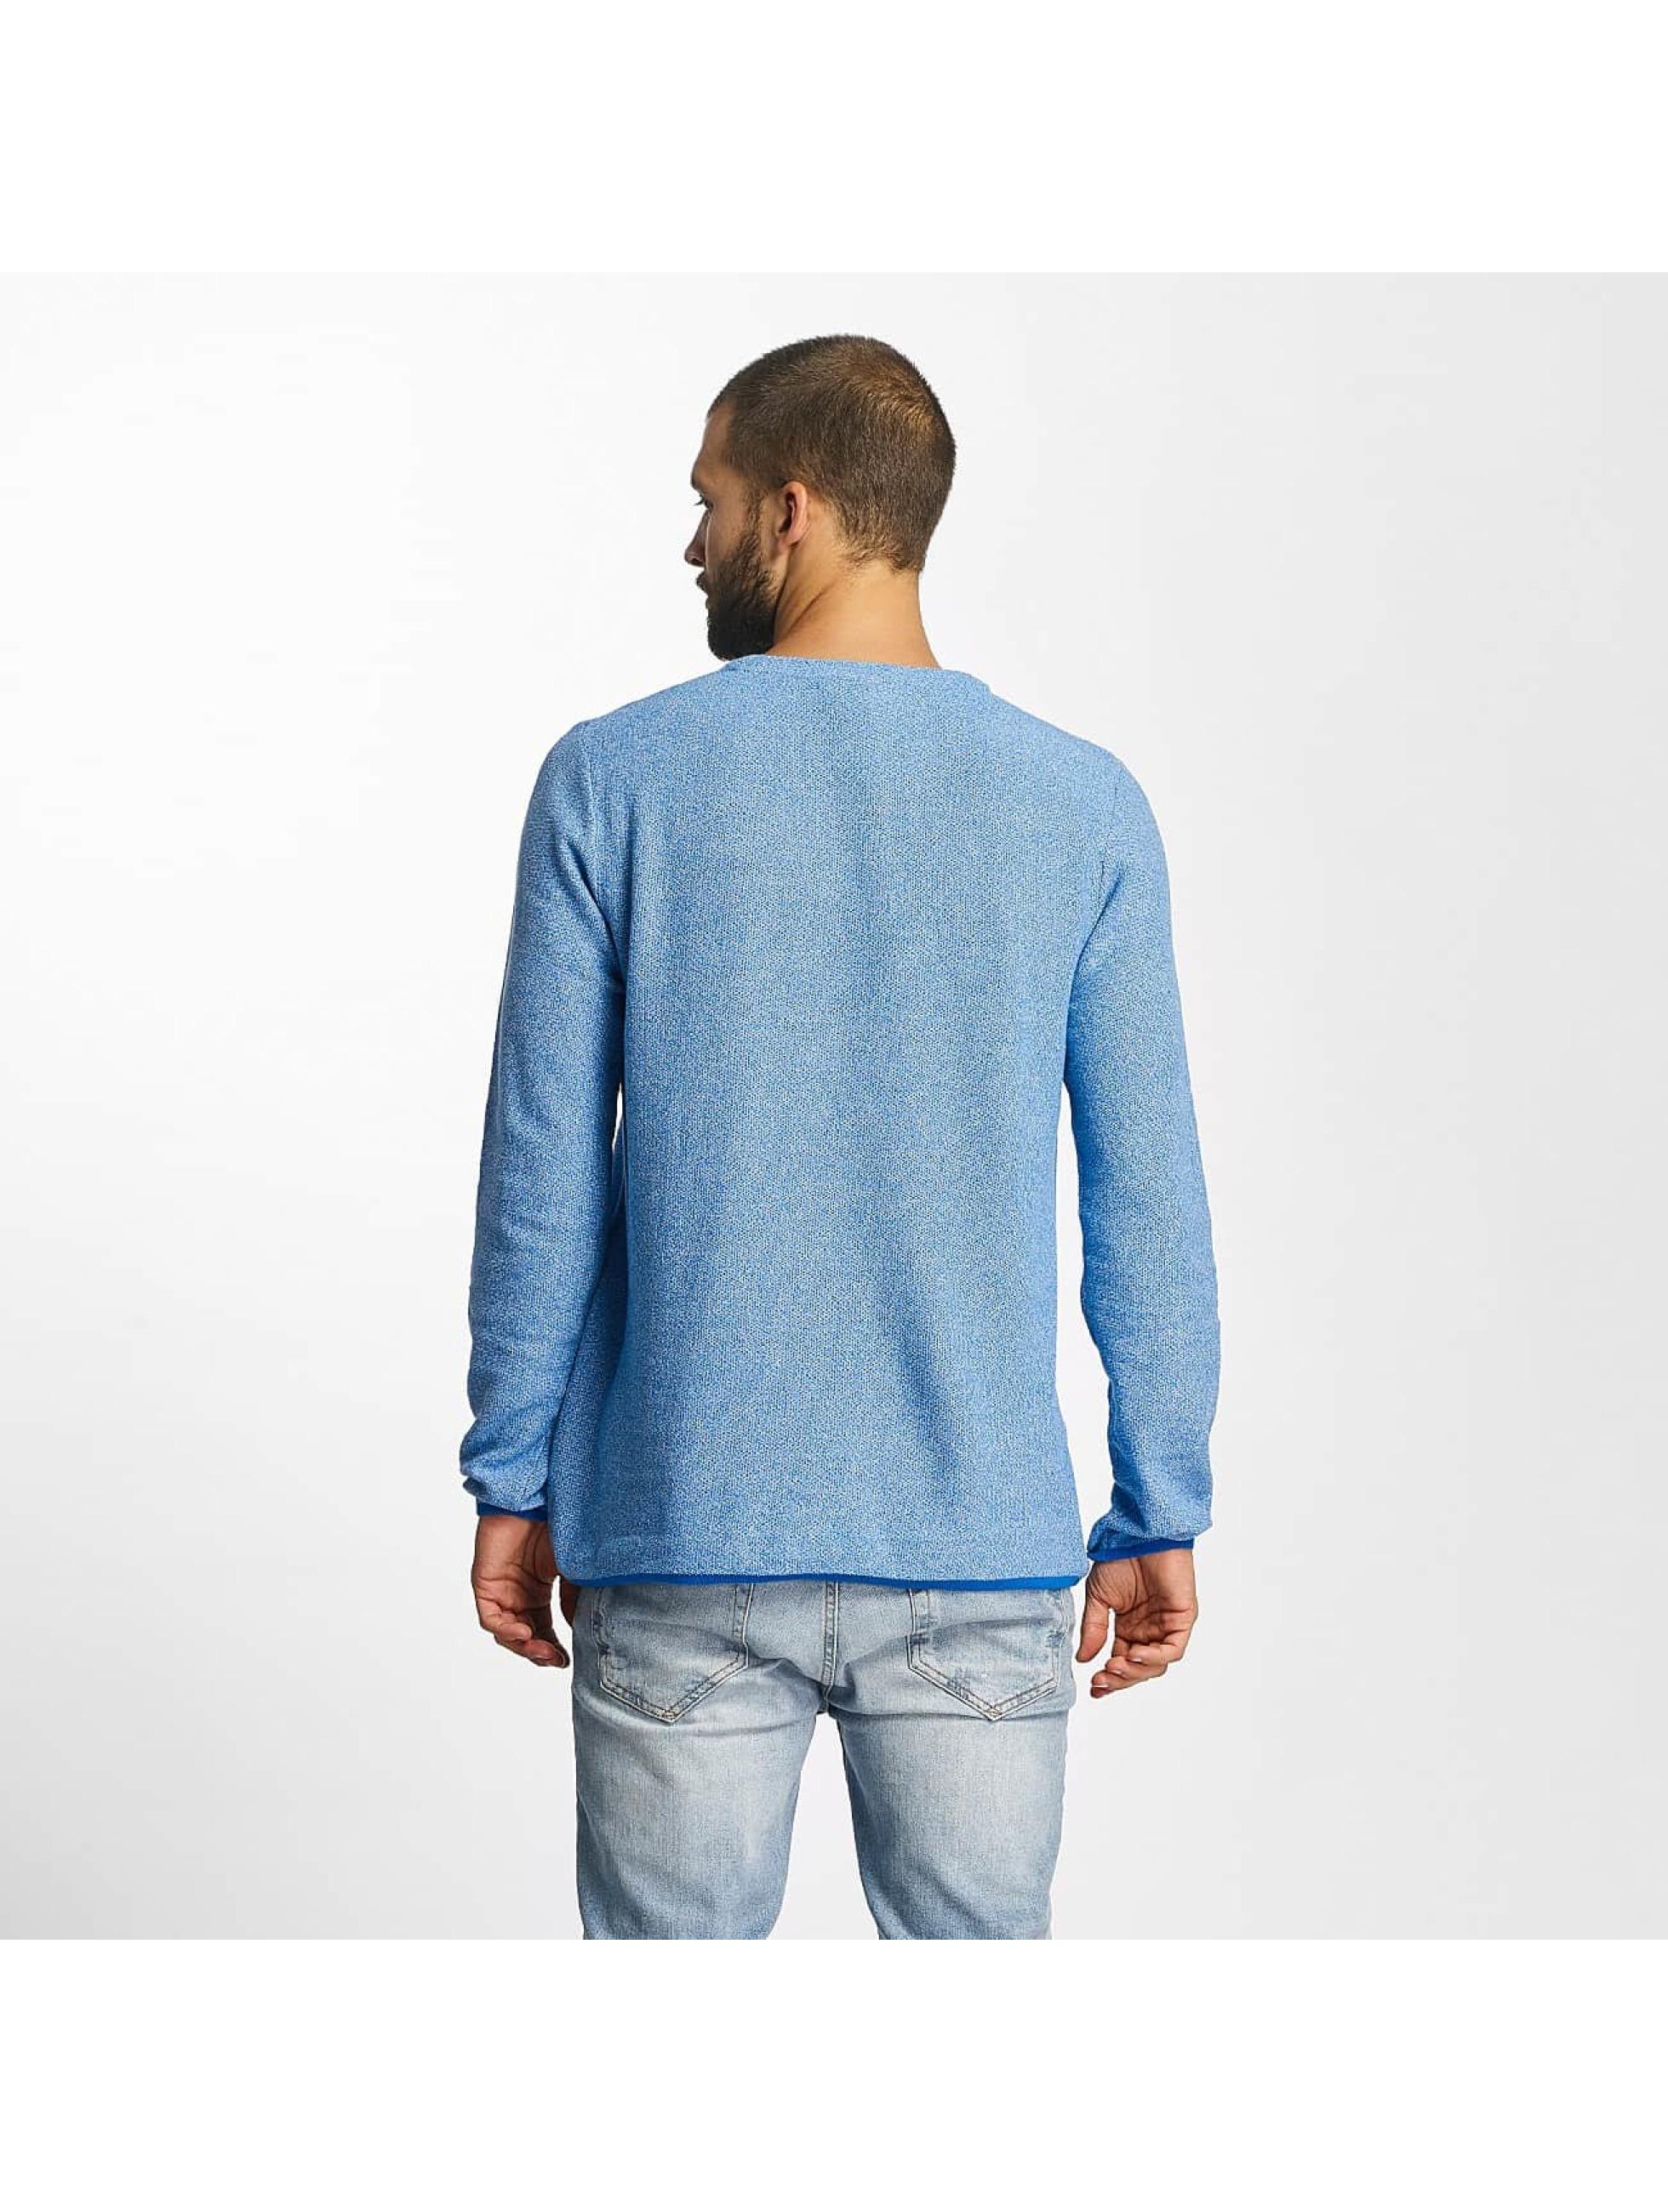 Bench Jumper Structured blue